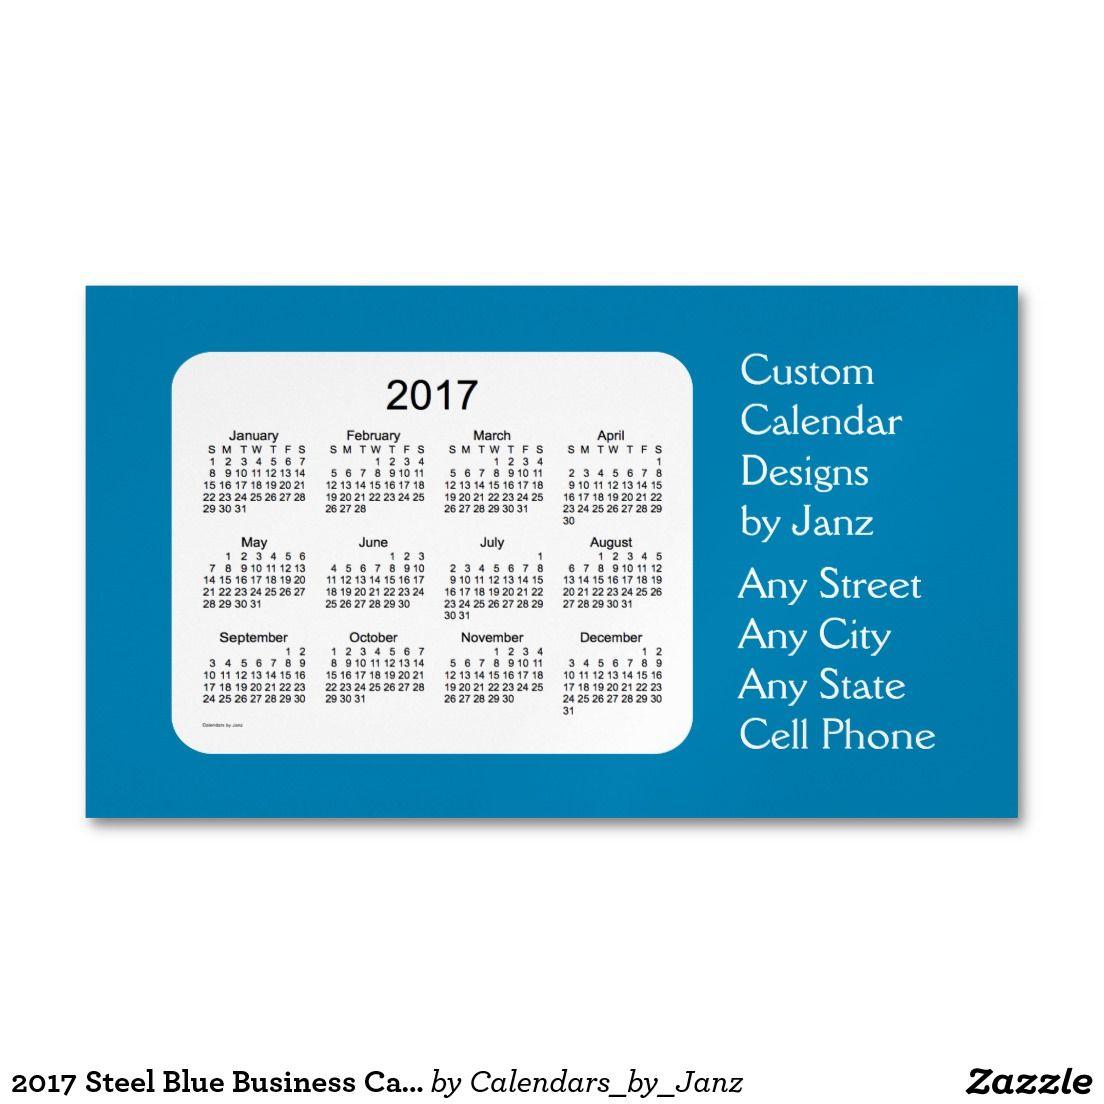 2017 Steel Blue Business Calendar by Janz Magnet Magnetic Business ...